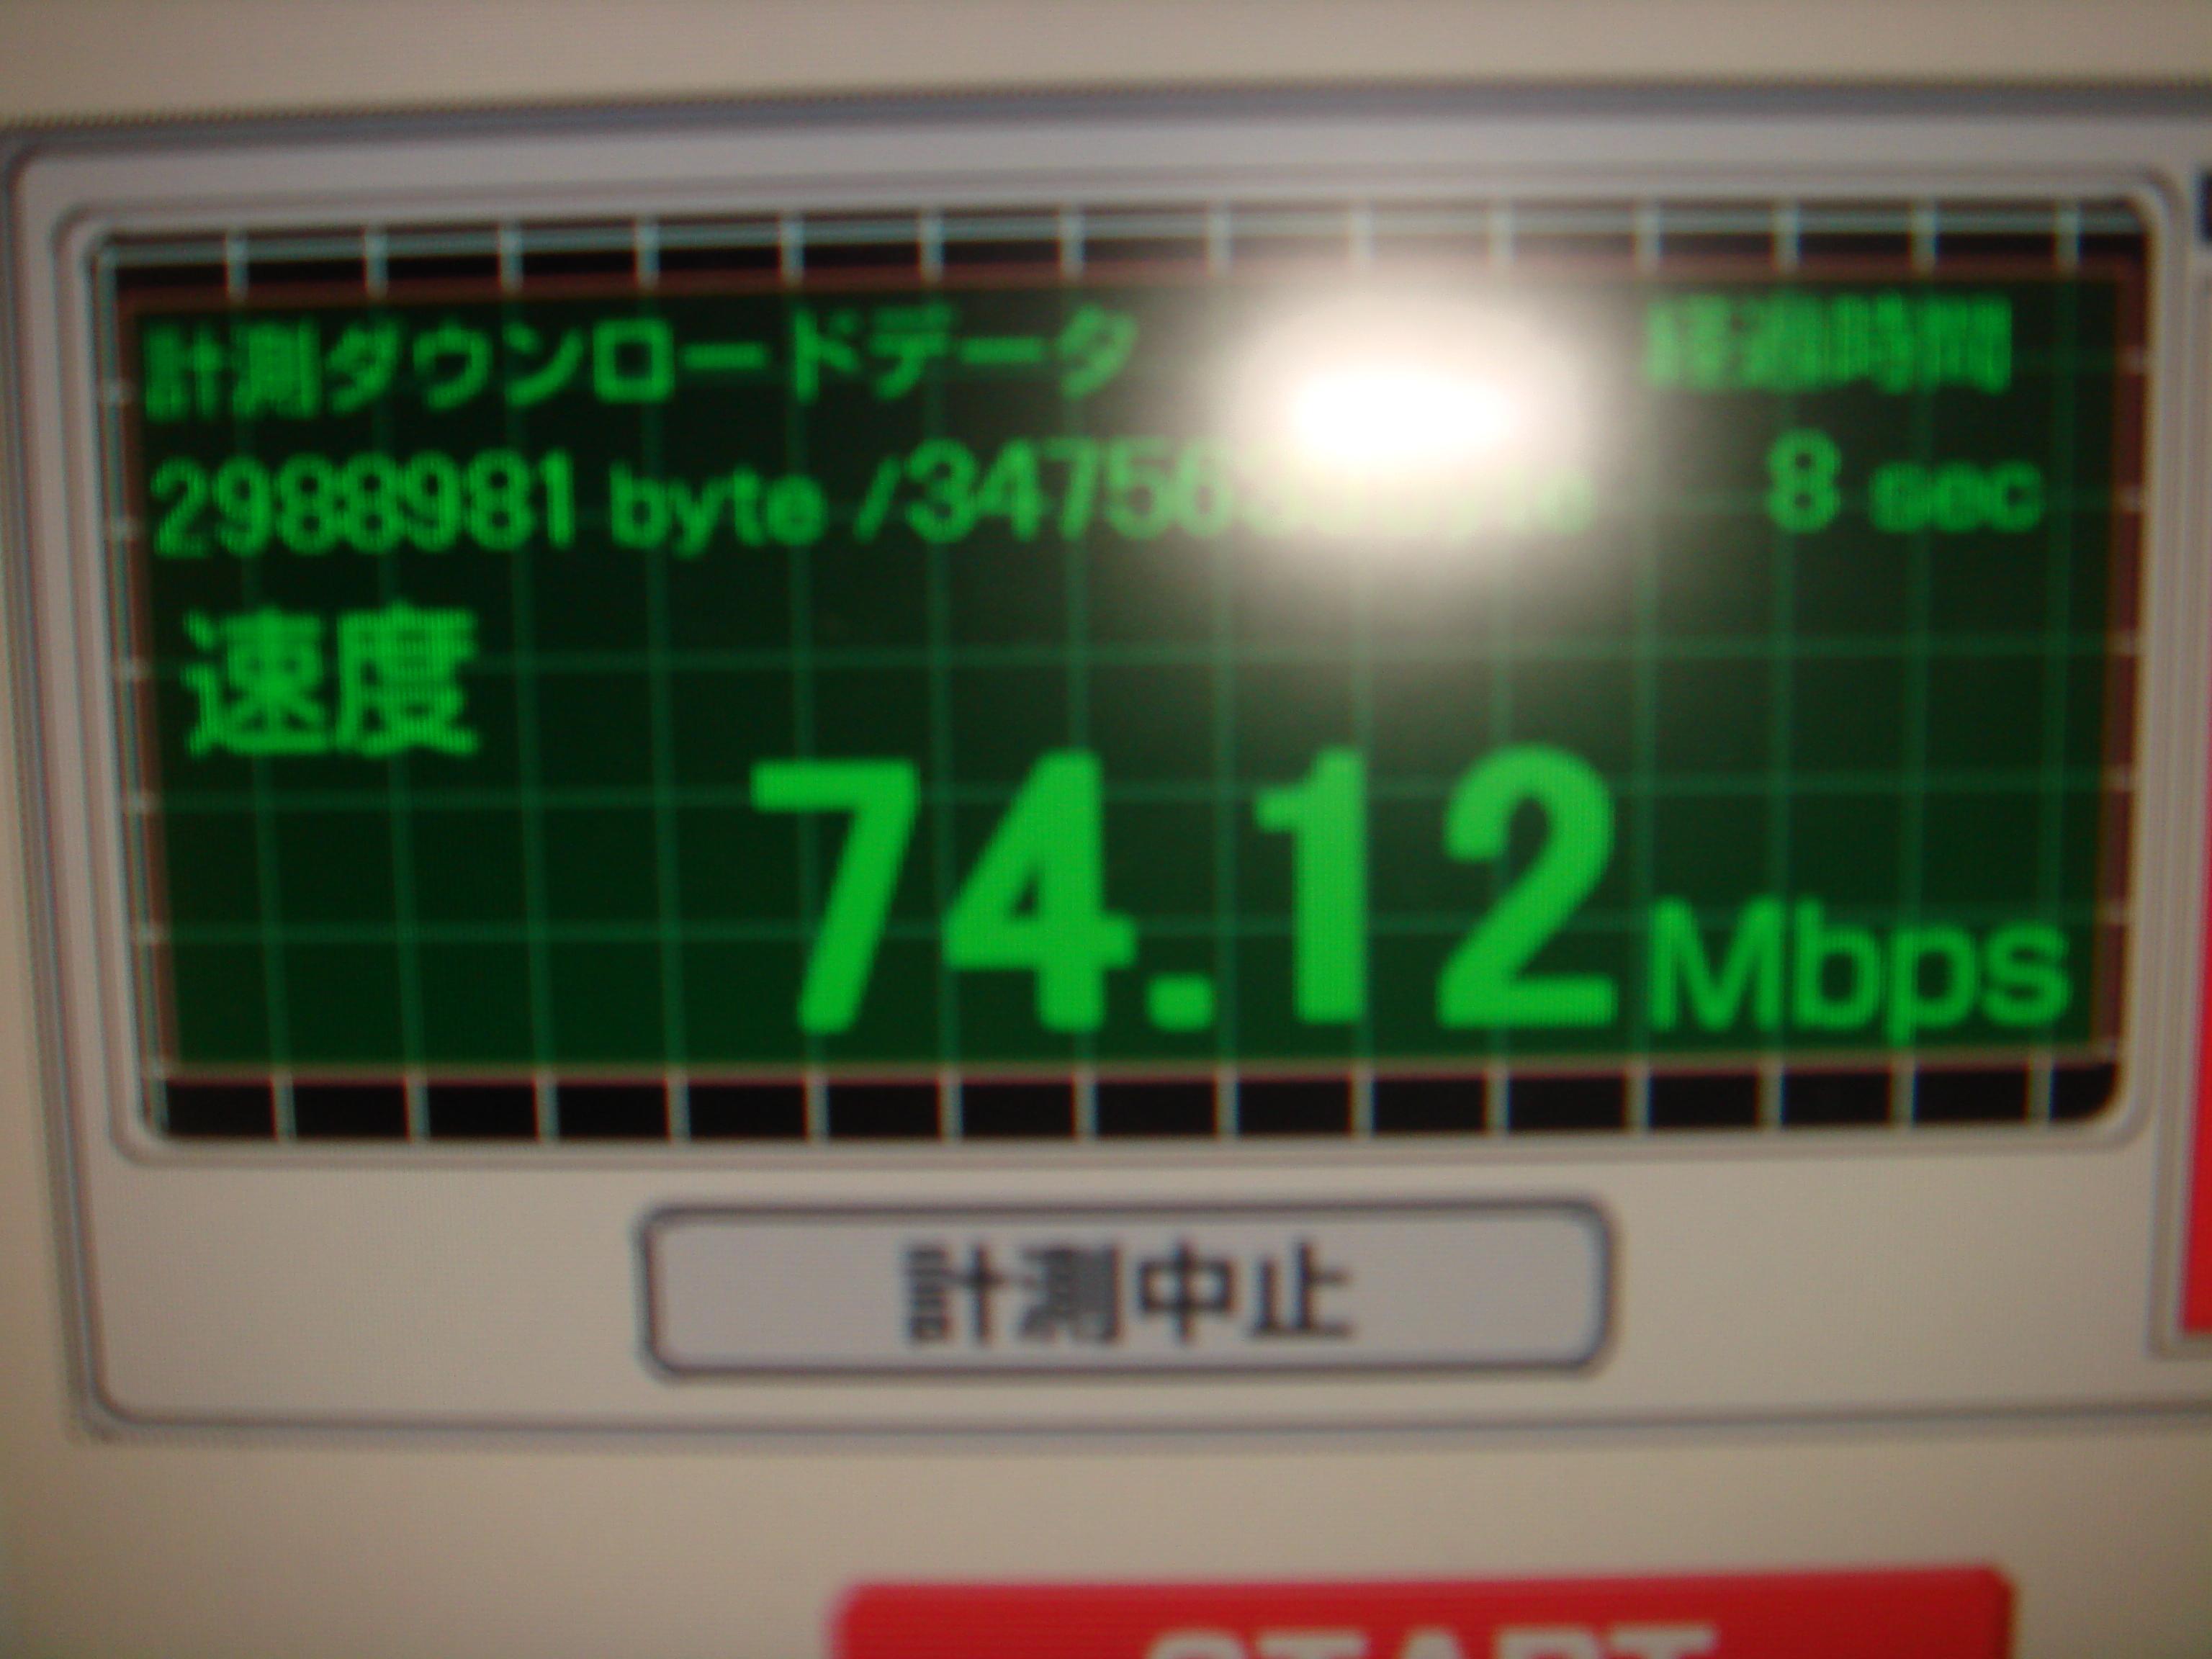 74.12 Mbps sono quasi 10 MBps!!!!!!!!!!!!!!